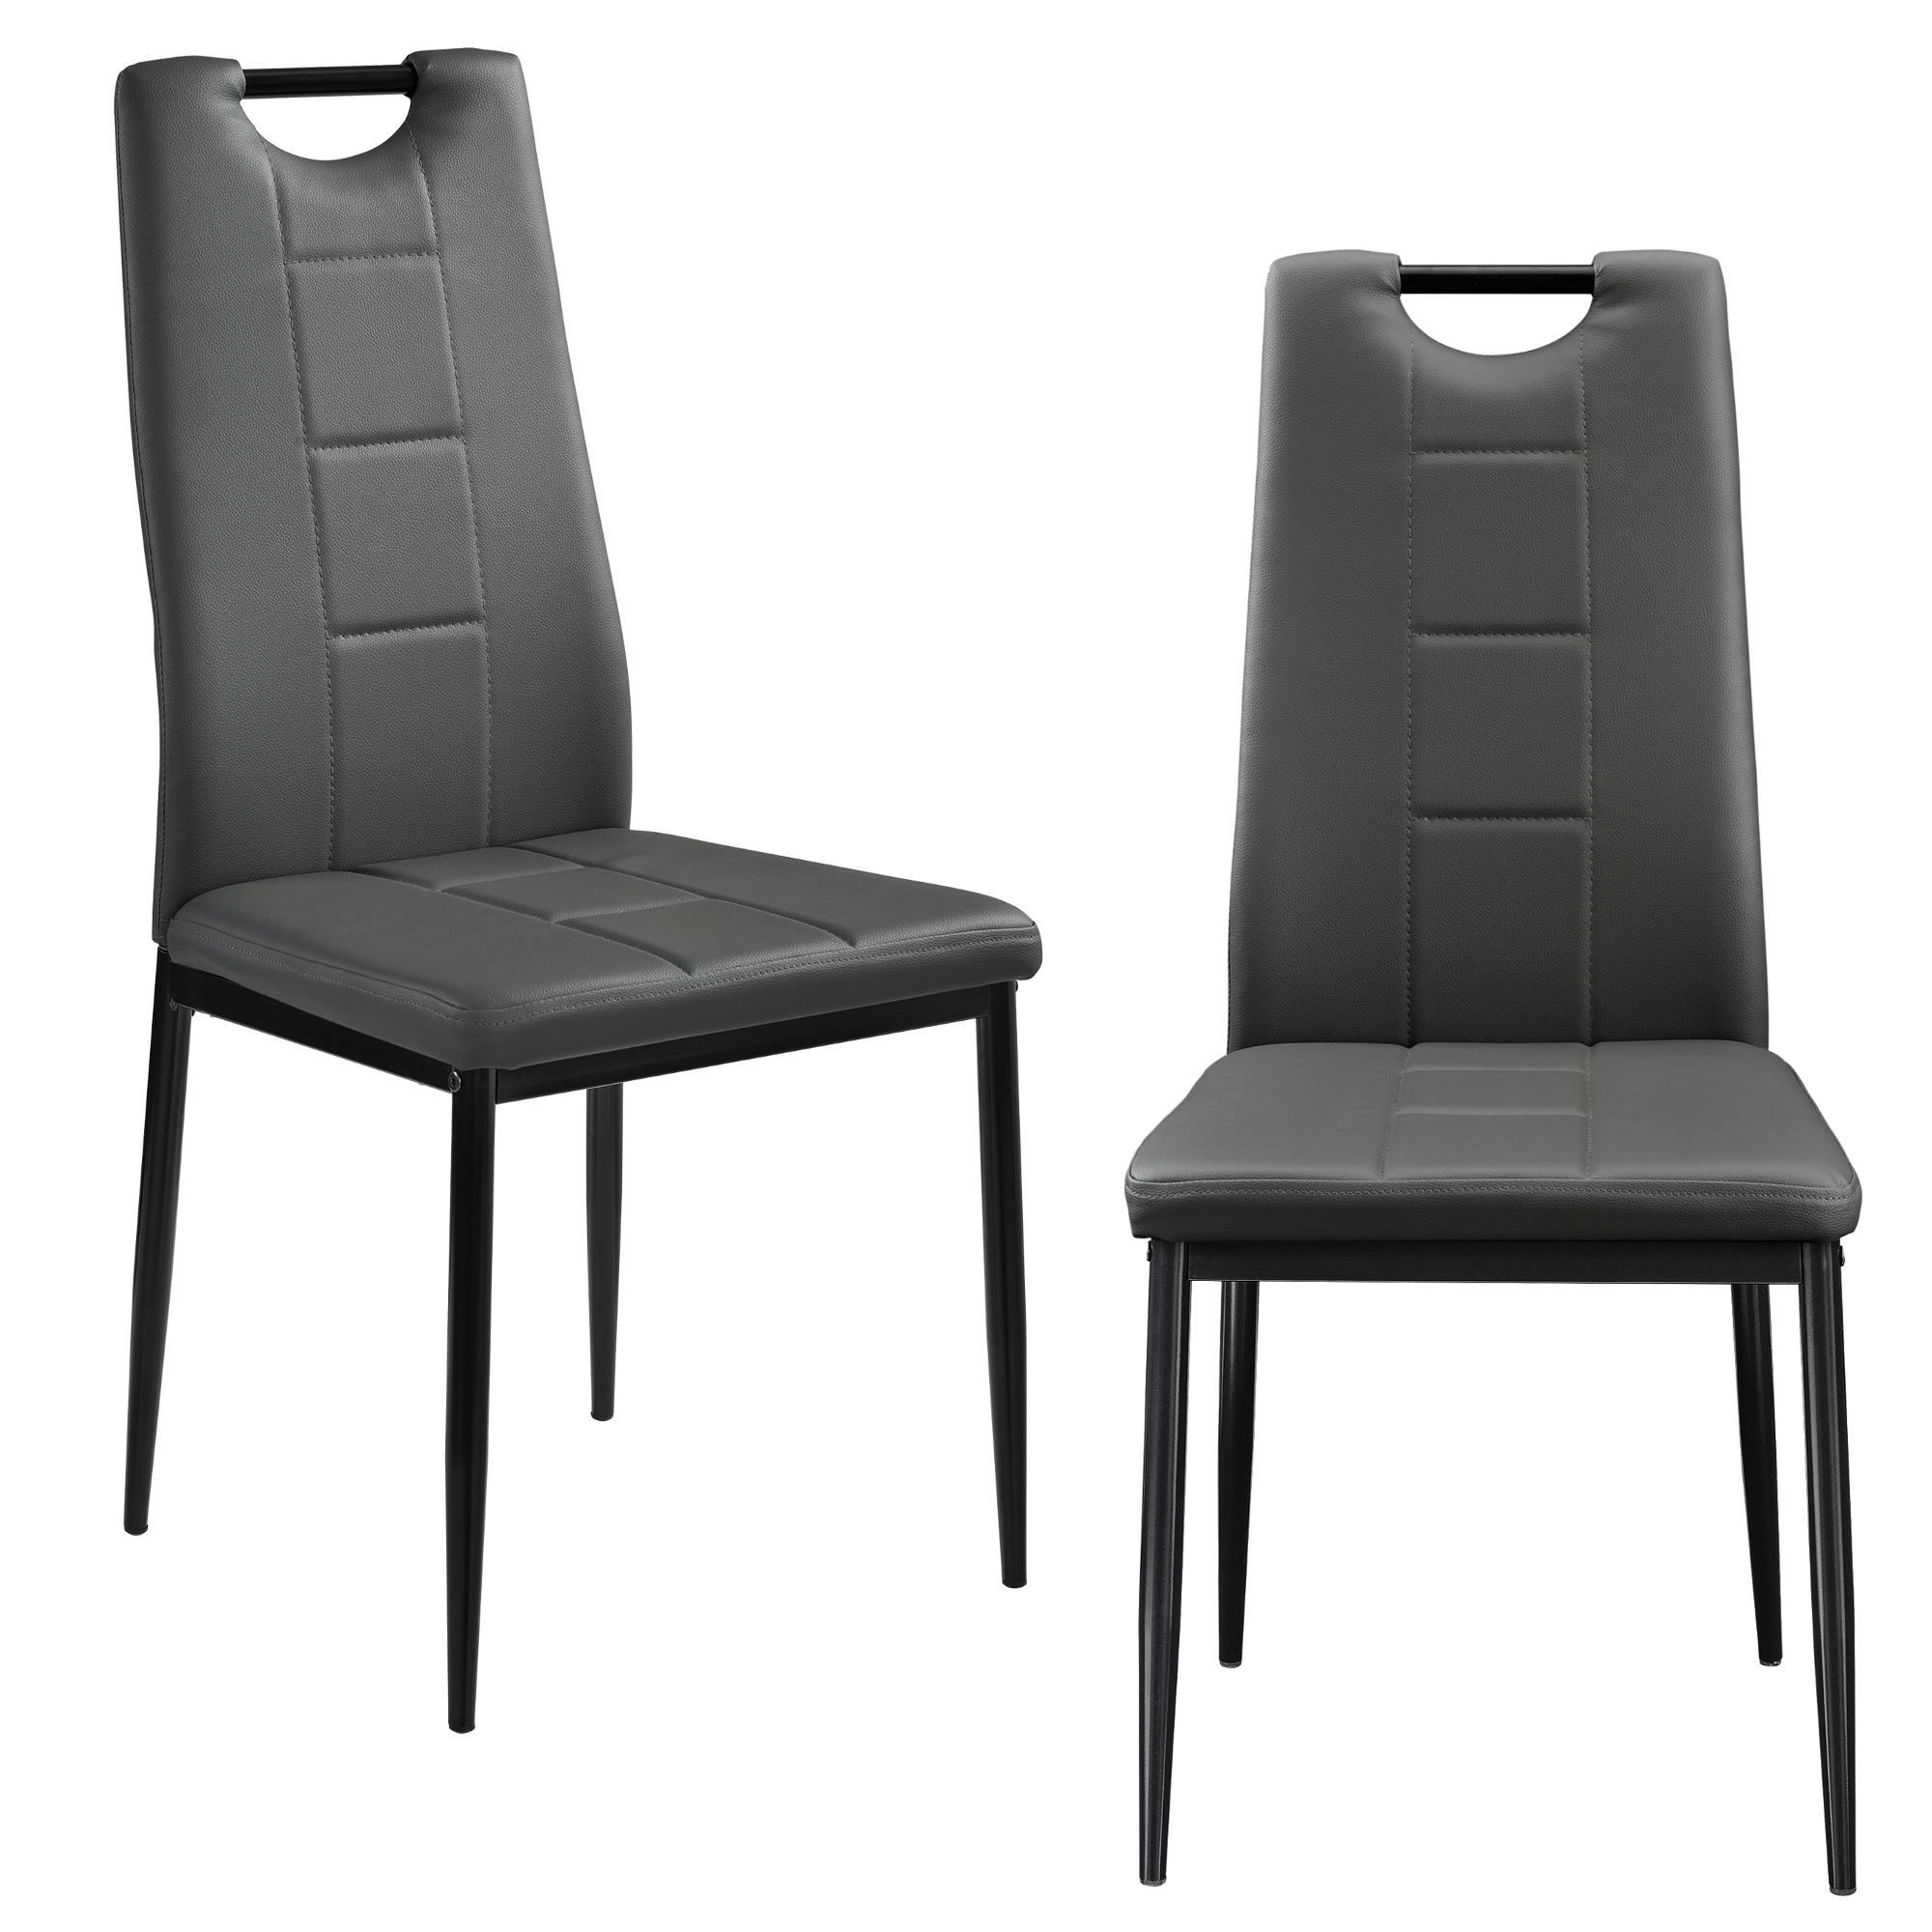 esszimmerstuhl 2er set wohnzimmer k chenstuhl esszimmer st hle griff ebay. Black Bedroom Furniture Sets. Home Design Ideas